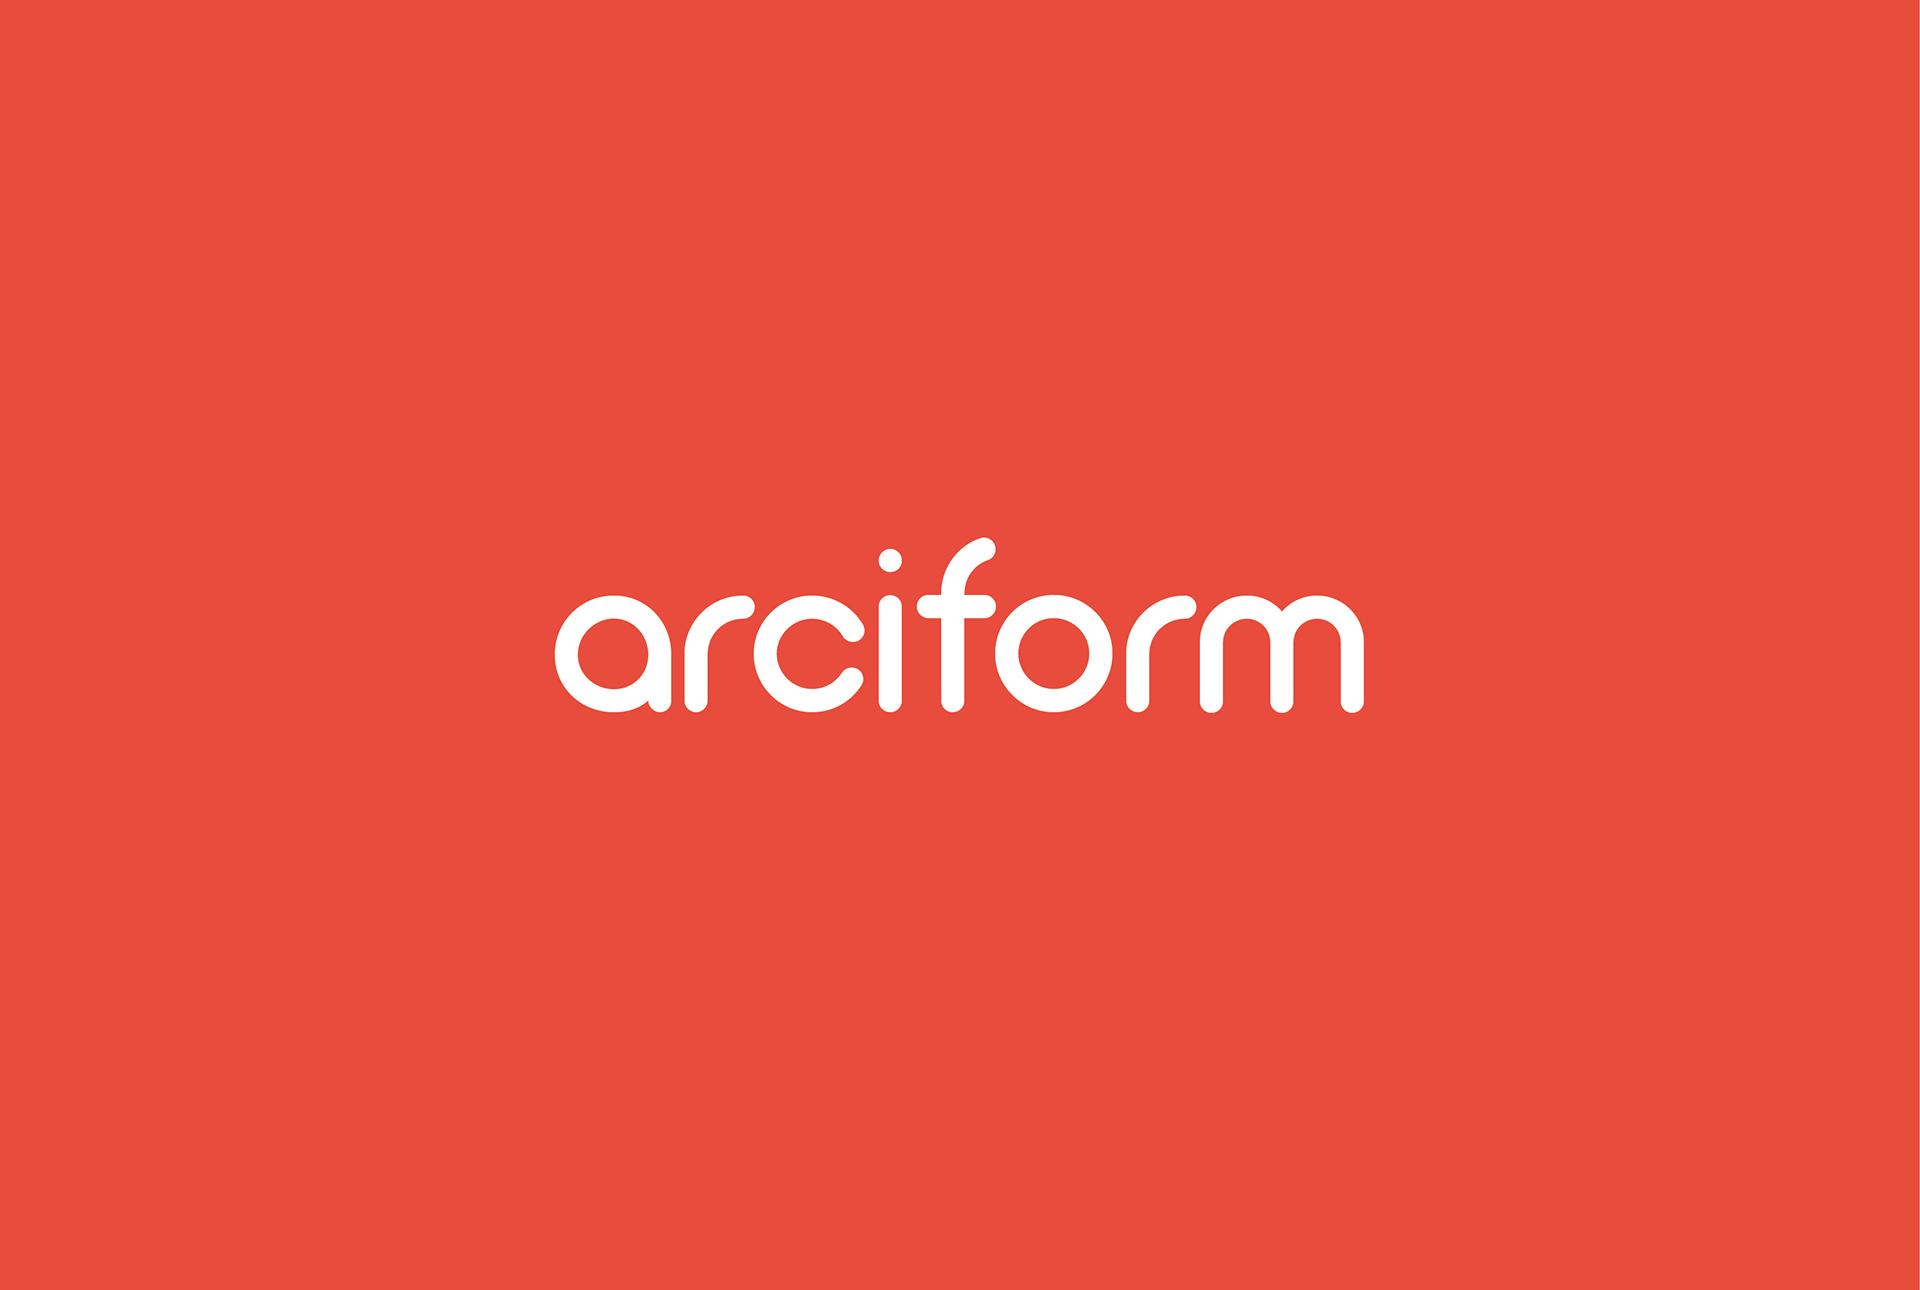 Free logo design fonts